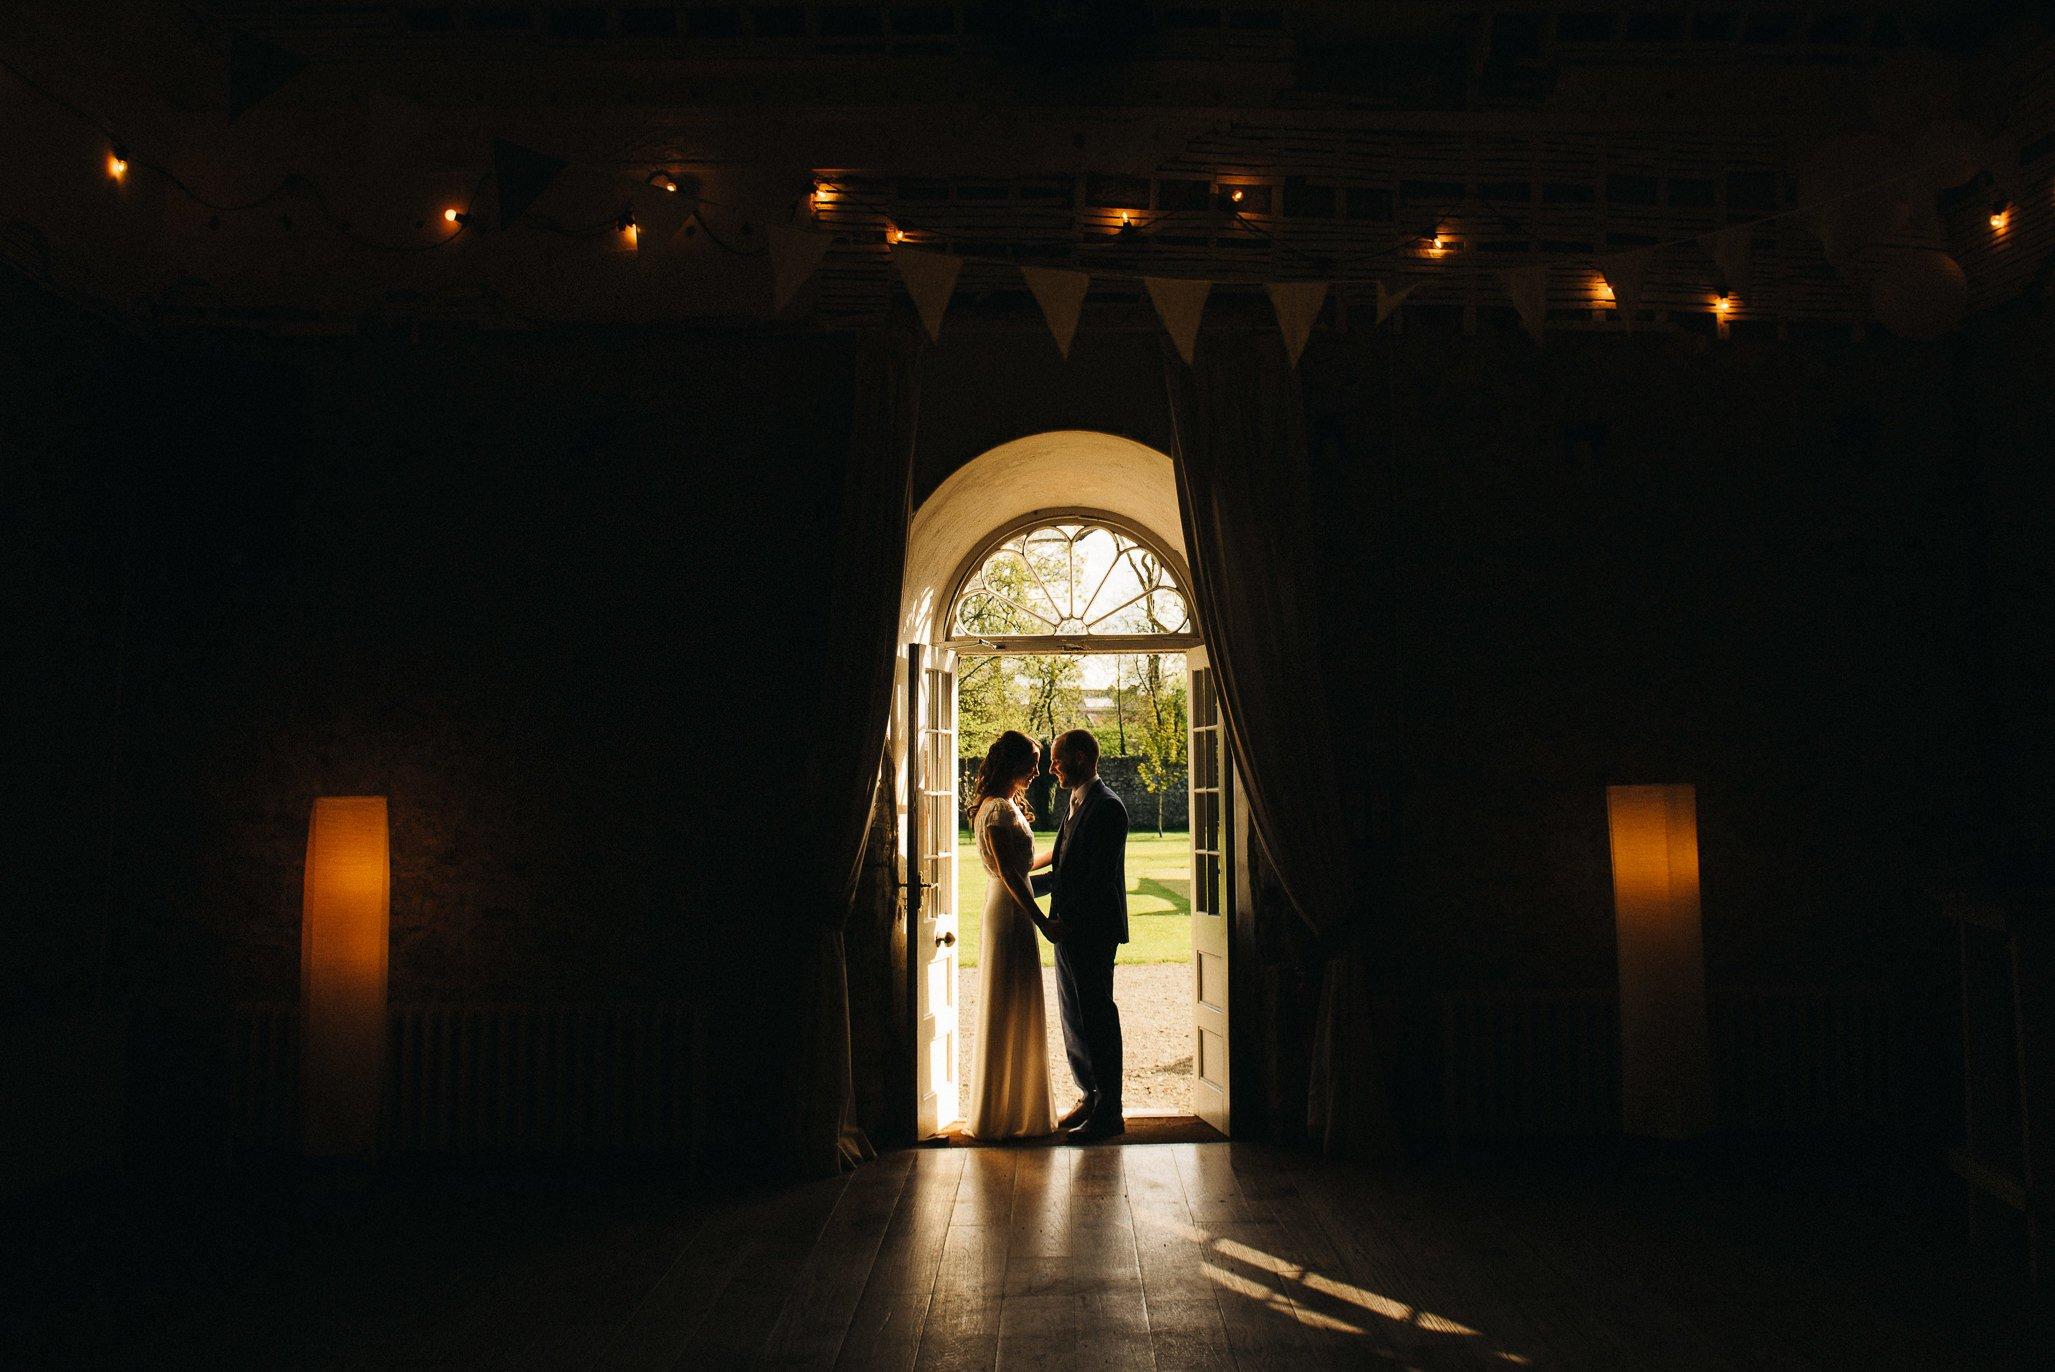 cloughjordan-house-wedding-igstudio-photography